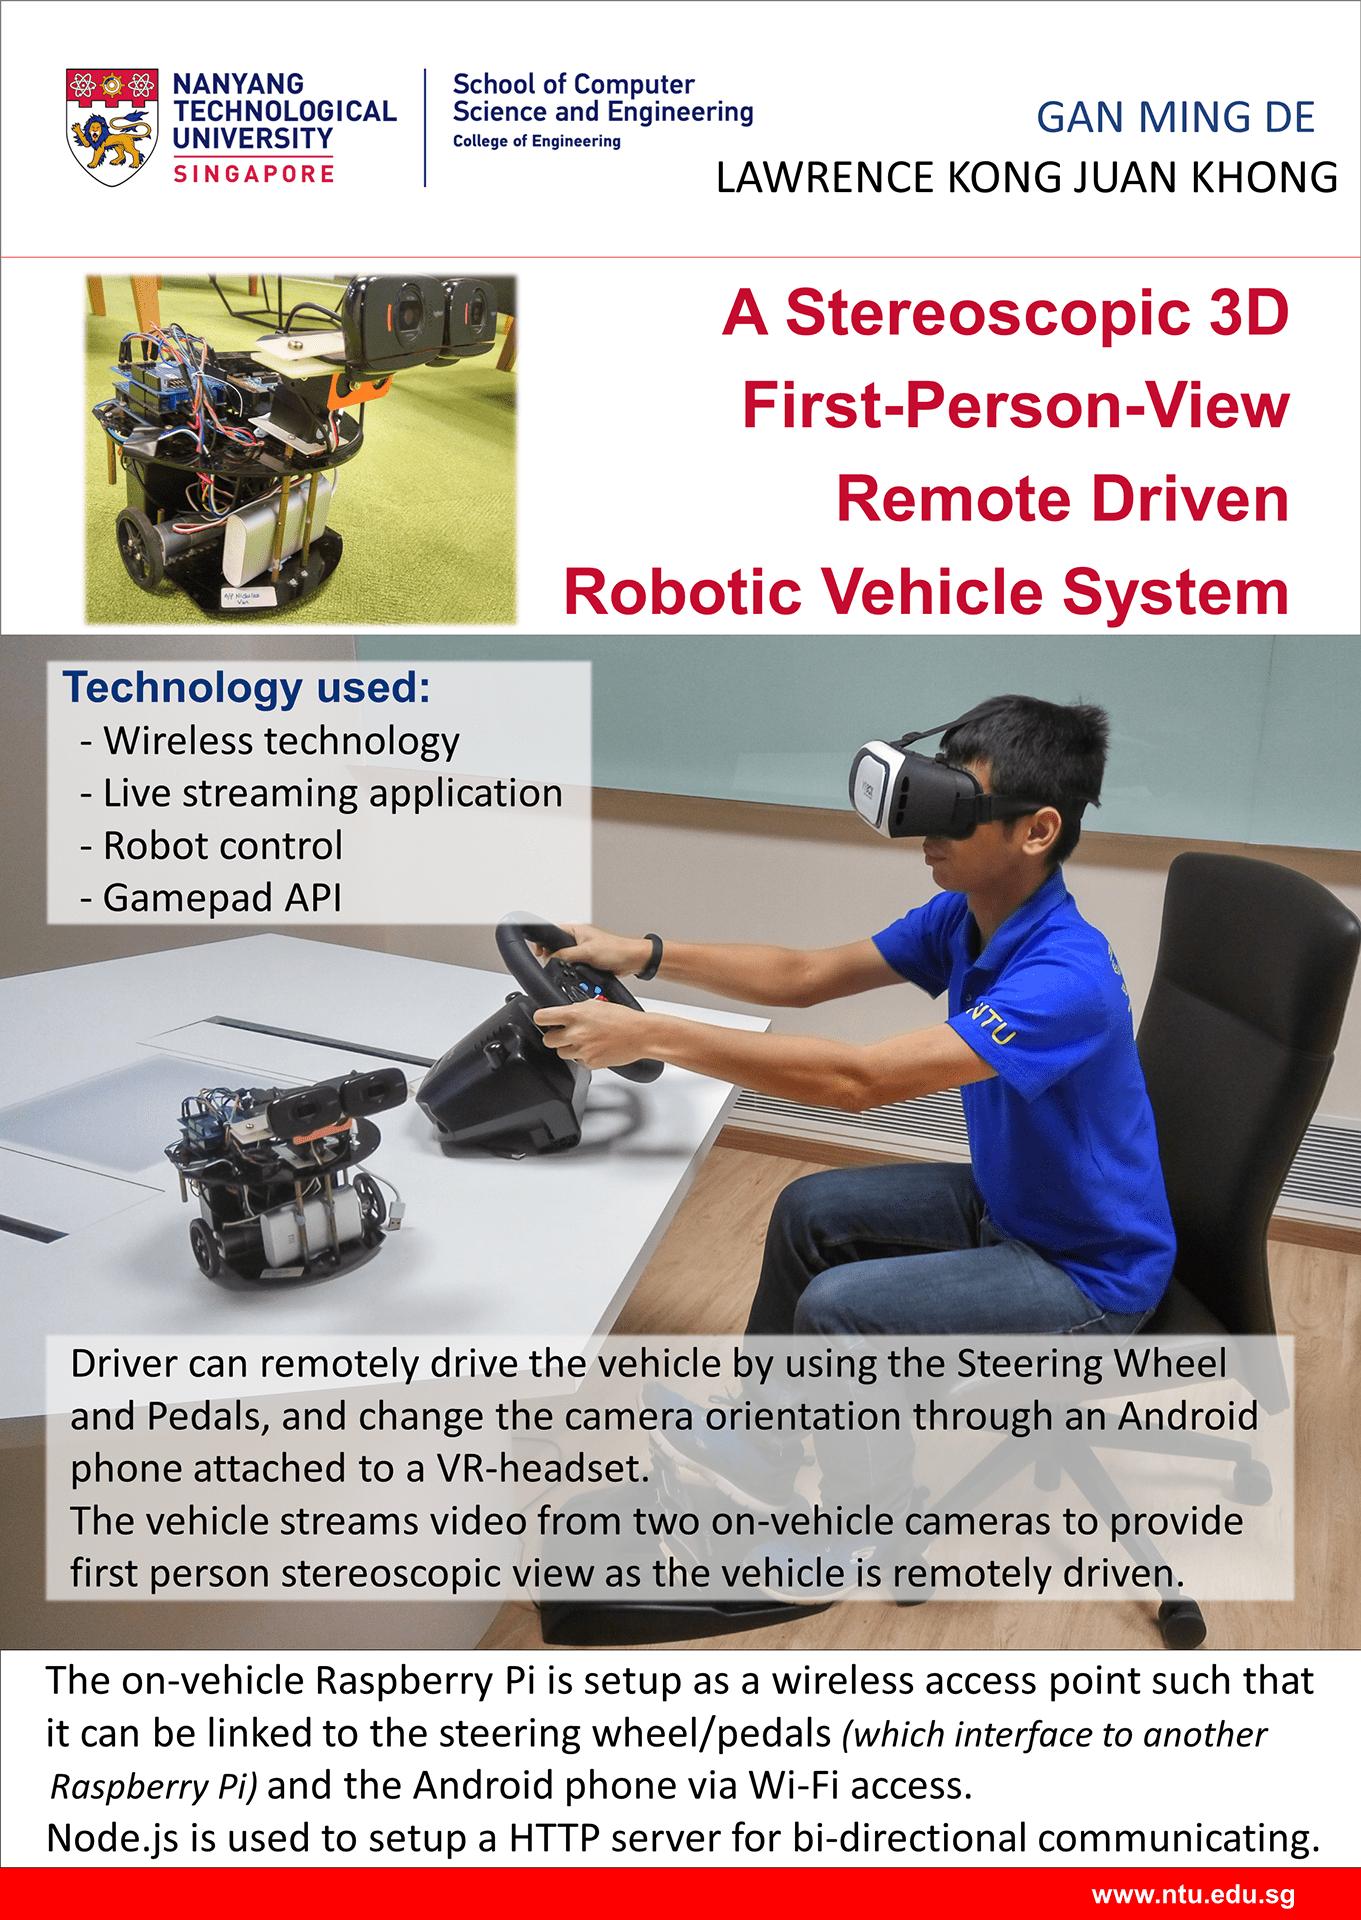 Web-based remote driven robotic vehicle